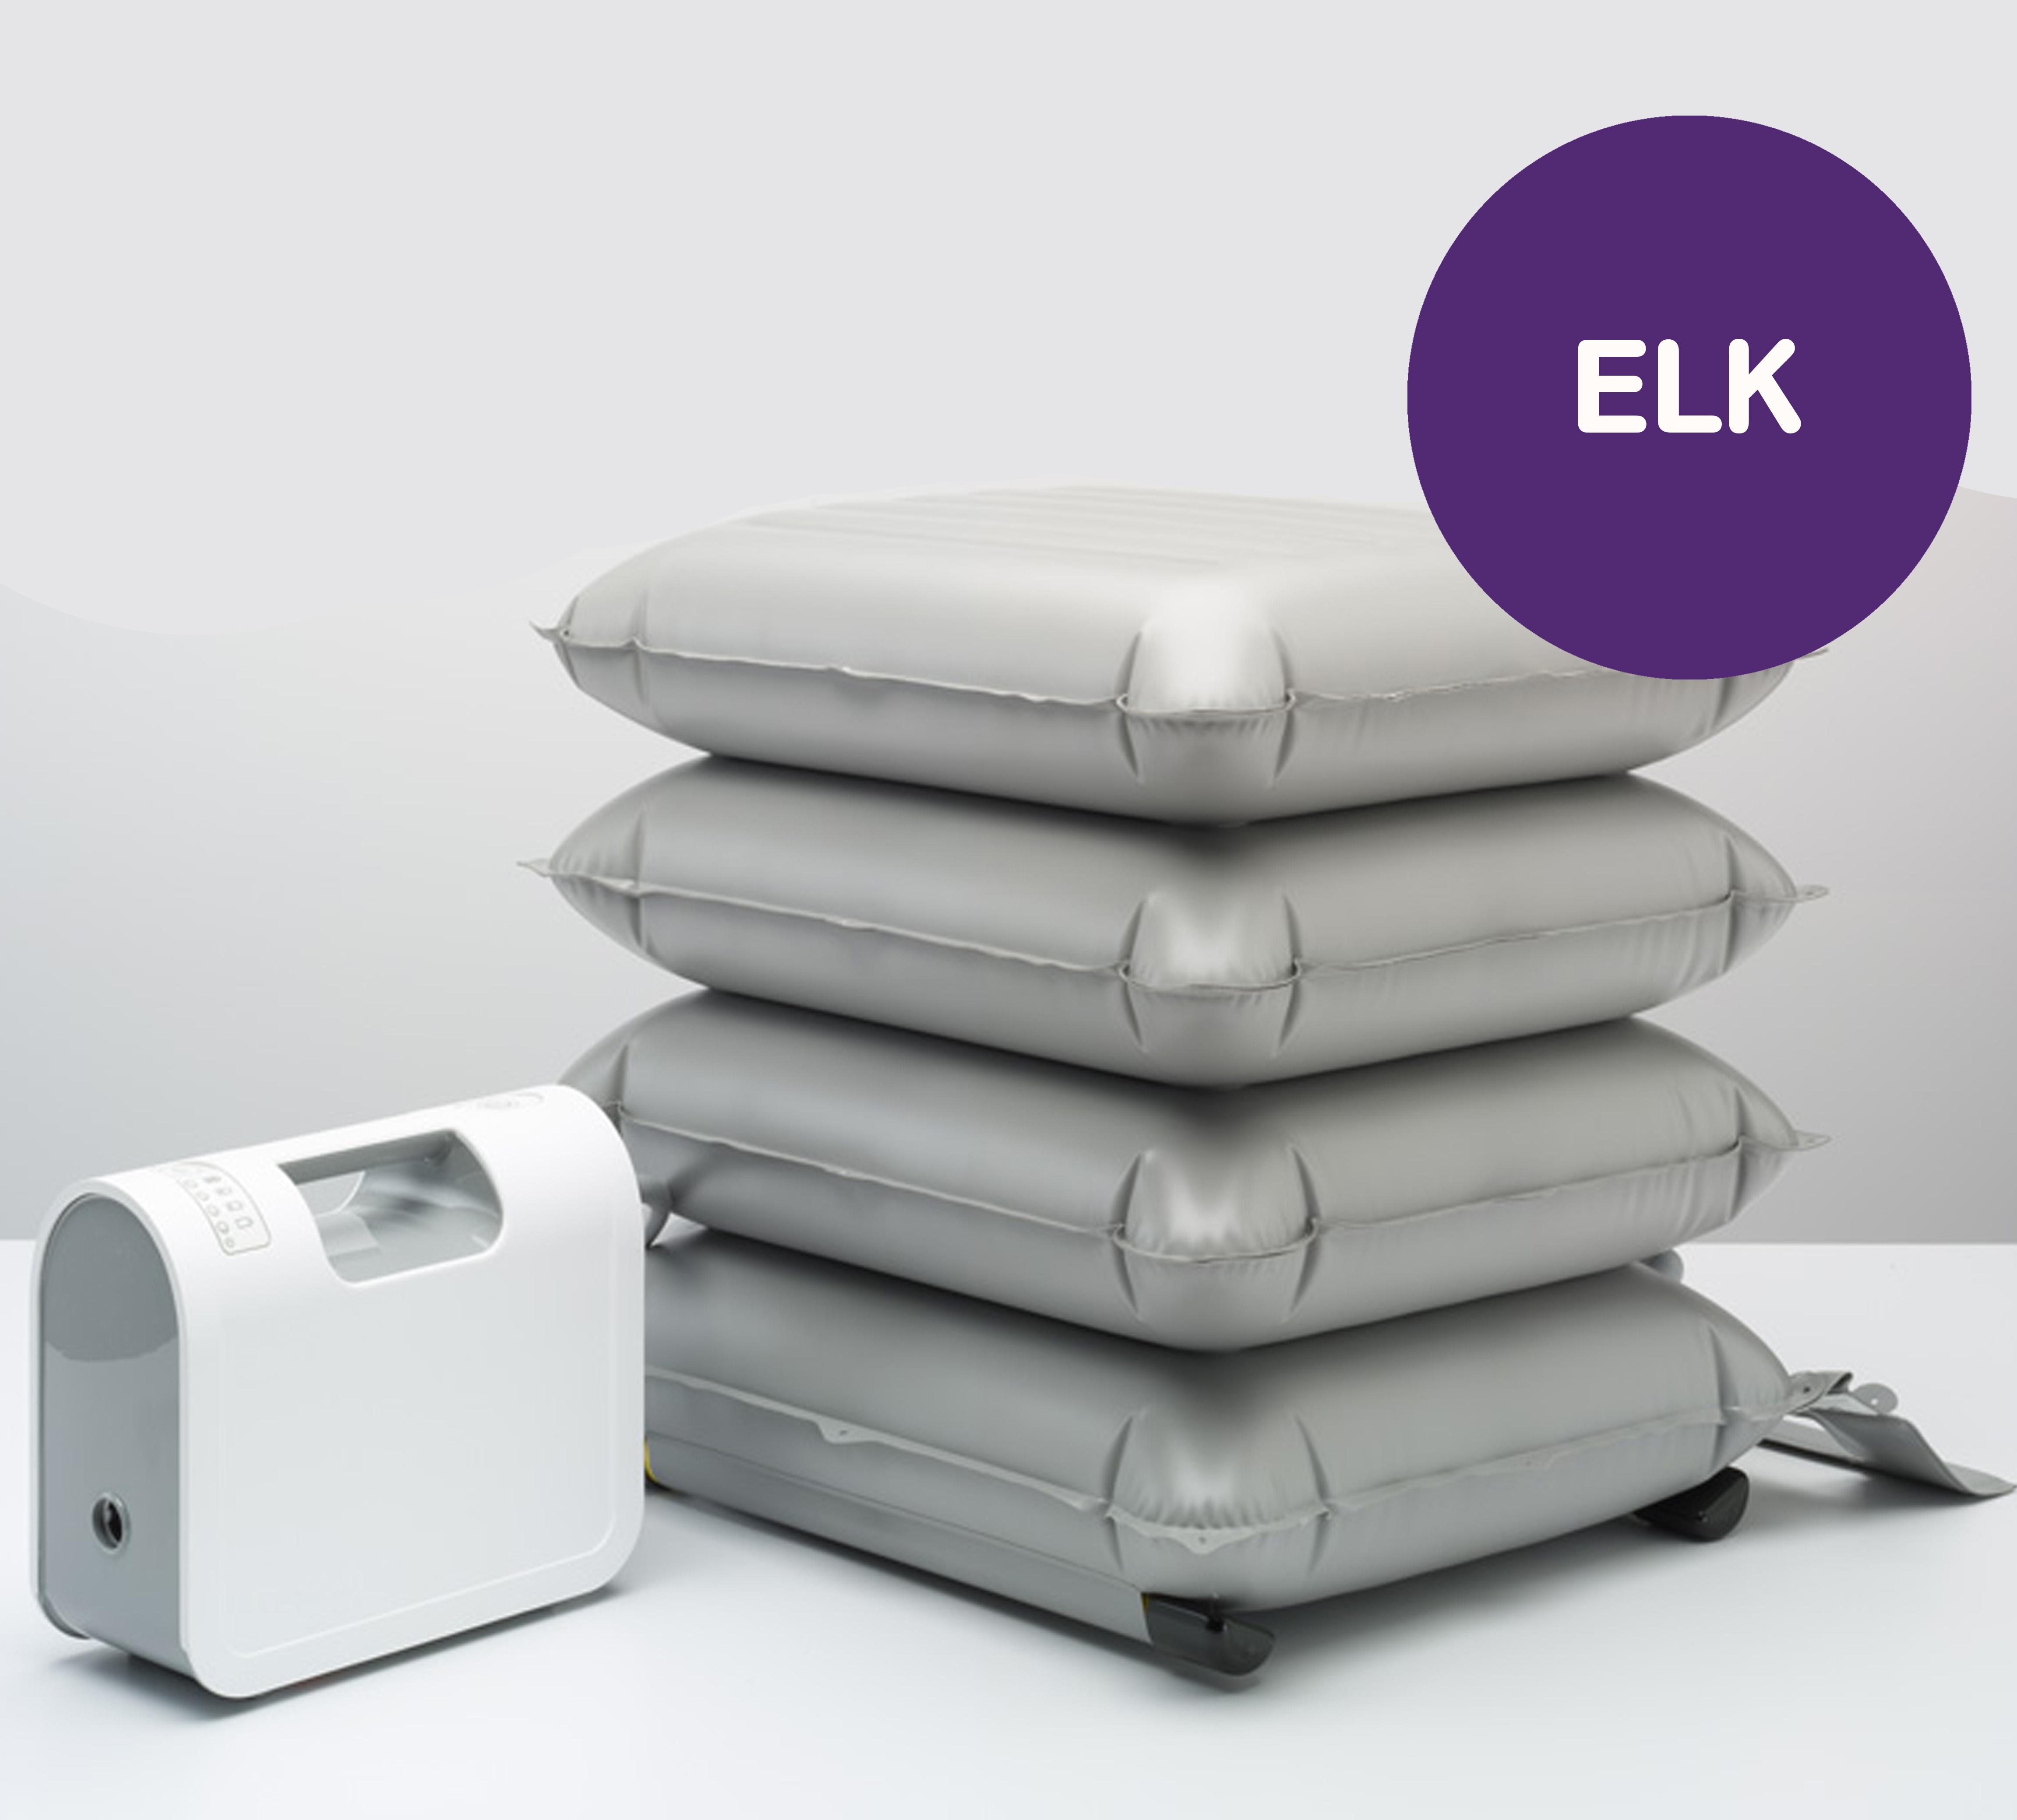 elk-new